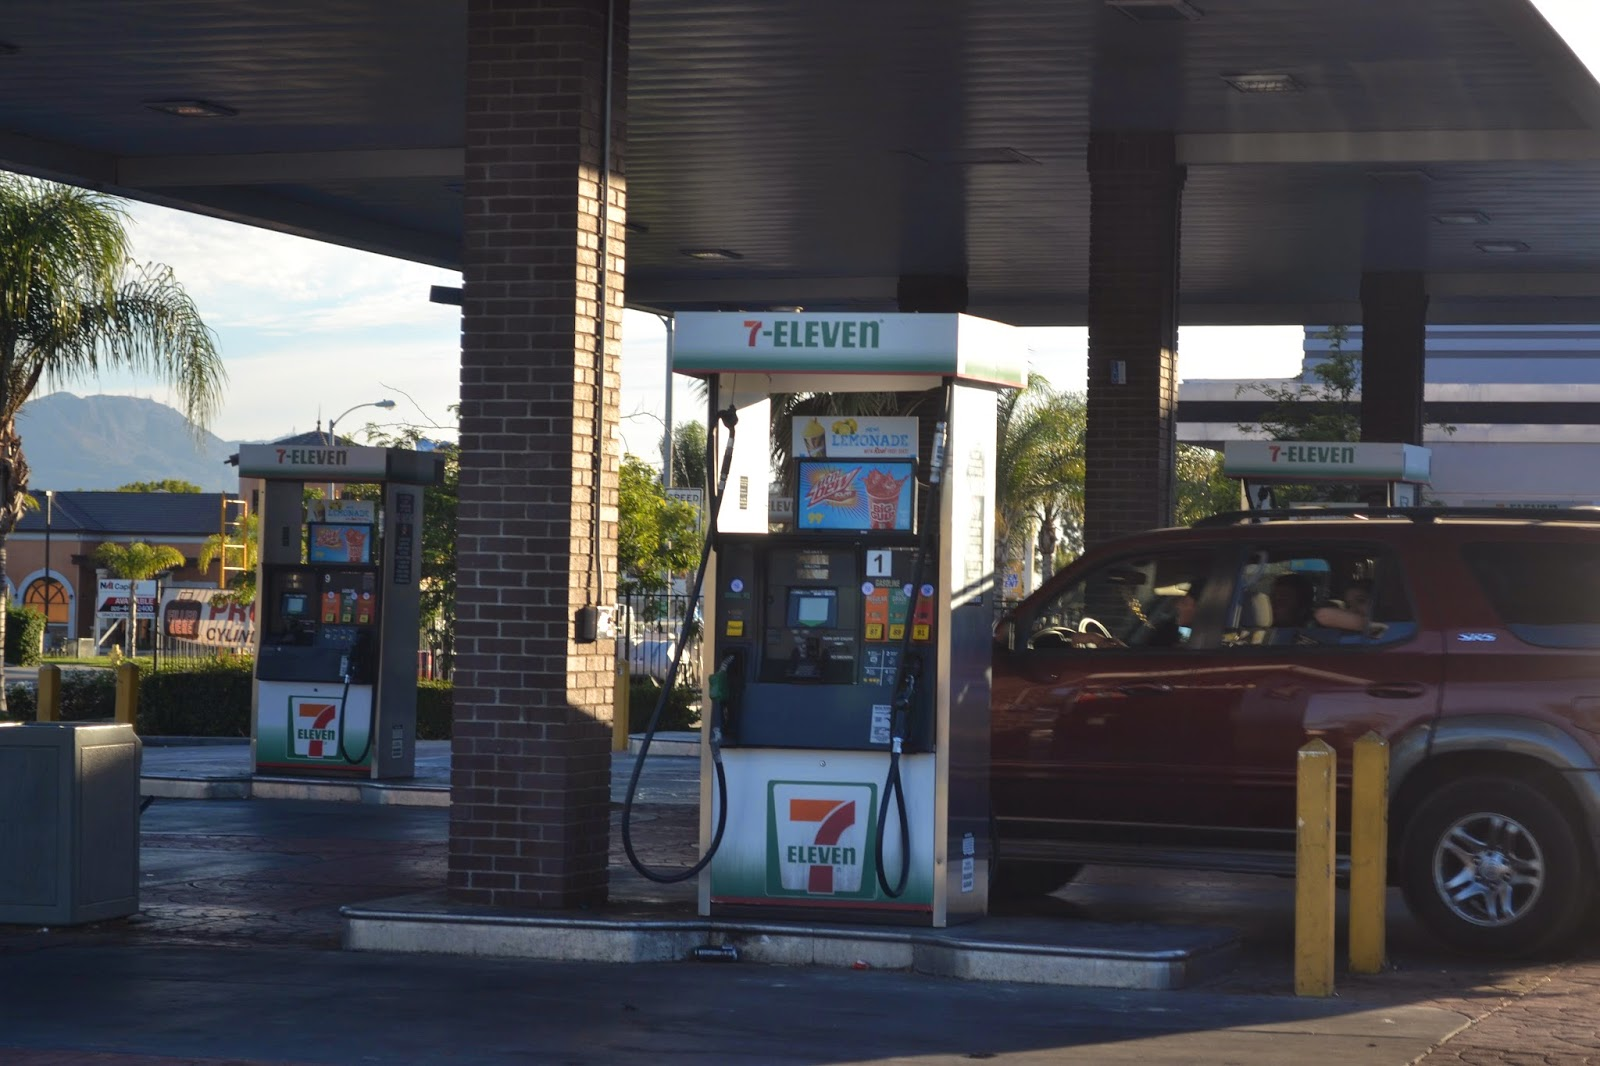 Oren S Money Saver 7 11 Is A Gas Station